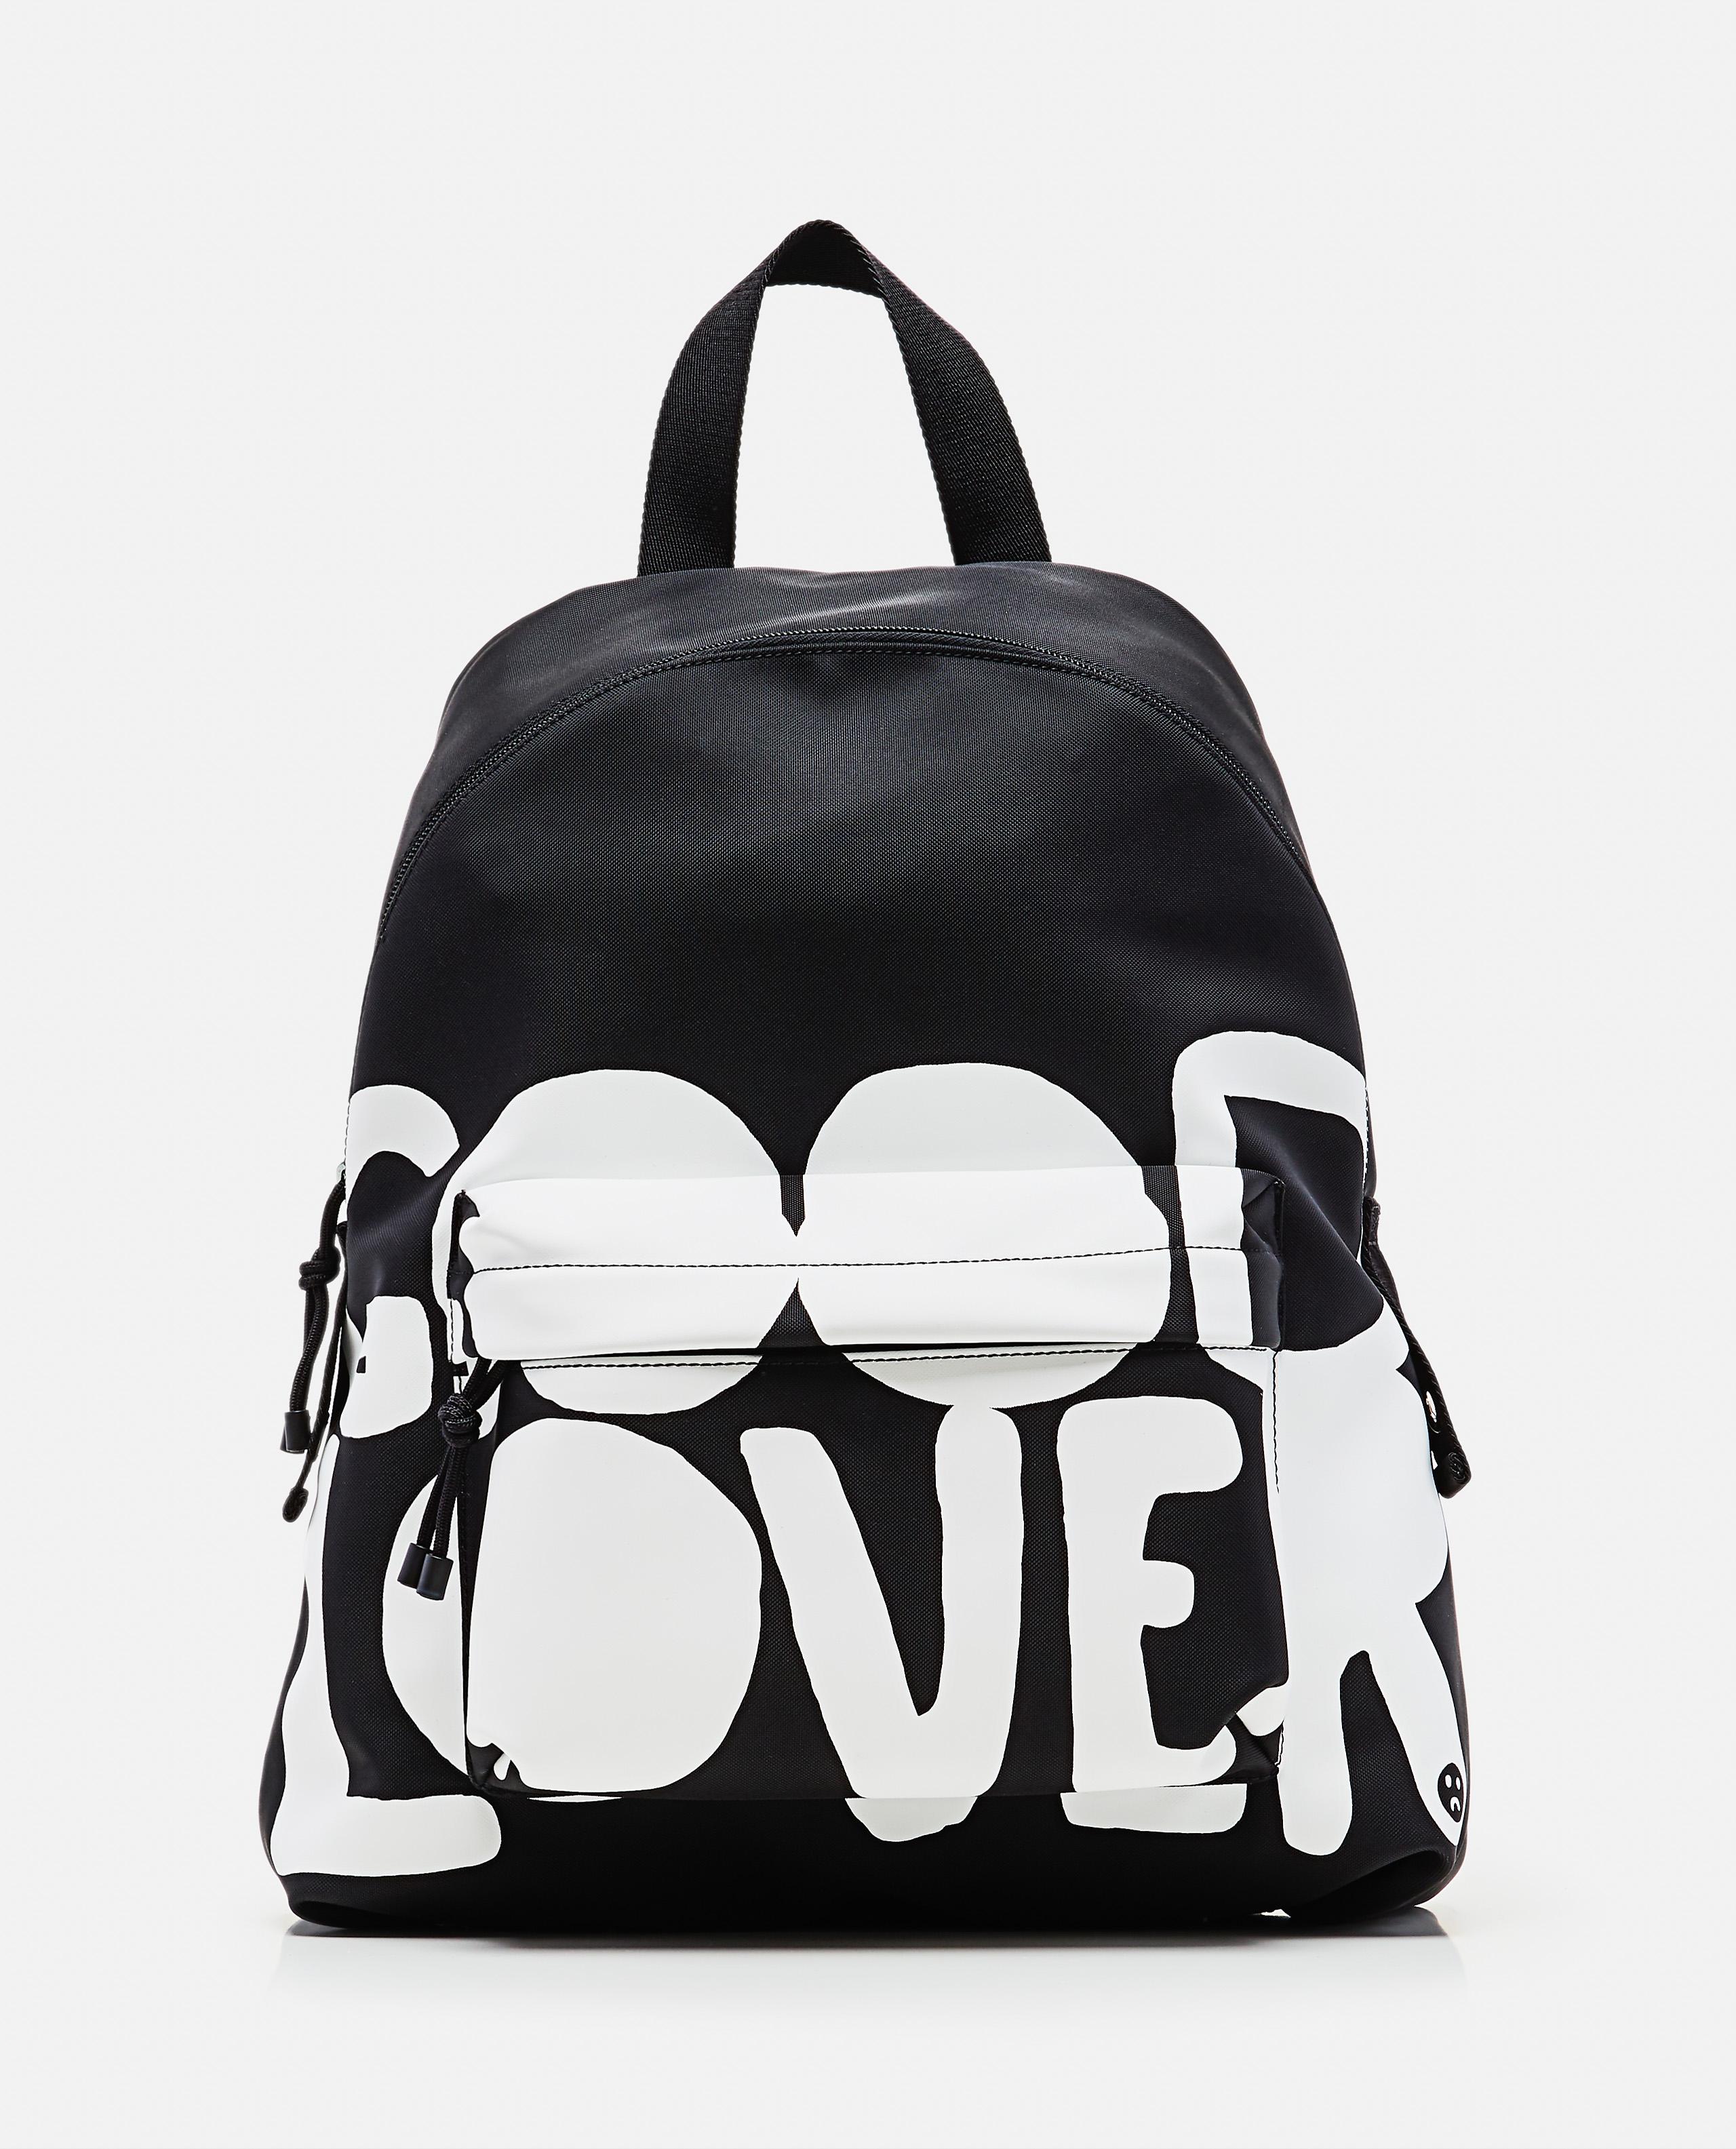 Valentino Garavani GOOD LOVER backpack